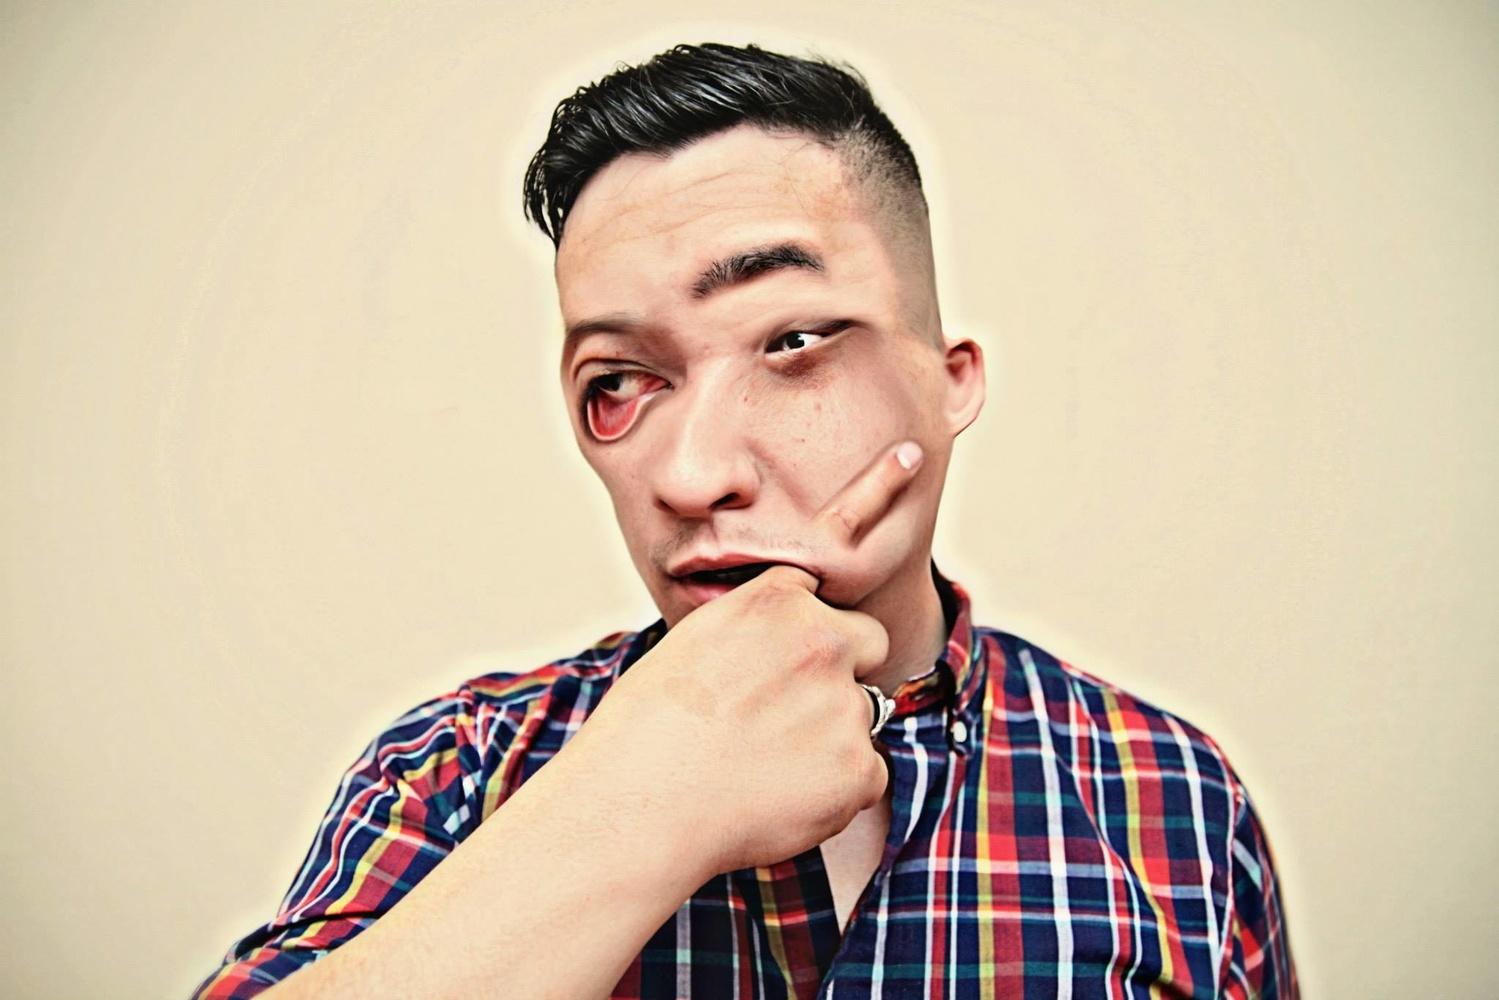 The Year 2020 - Self Portrait by Joshua Foo